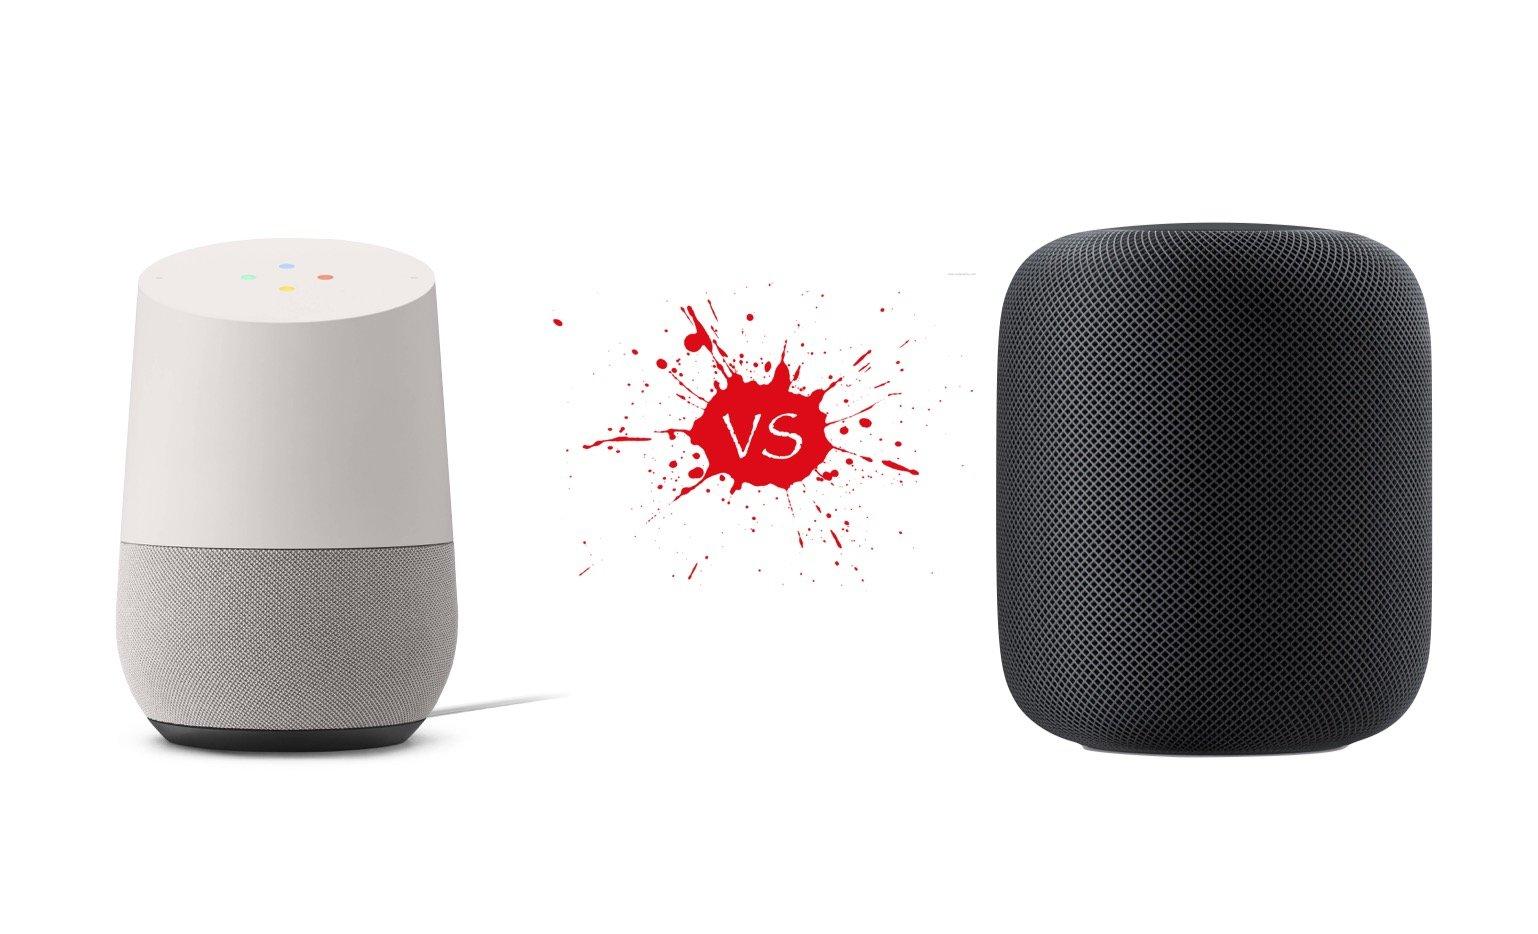 Homepod vs Google Home